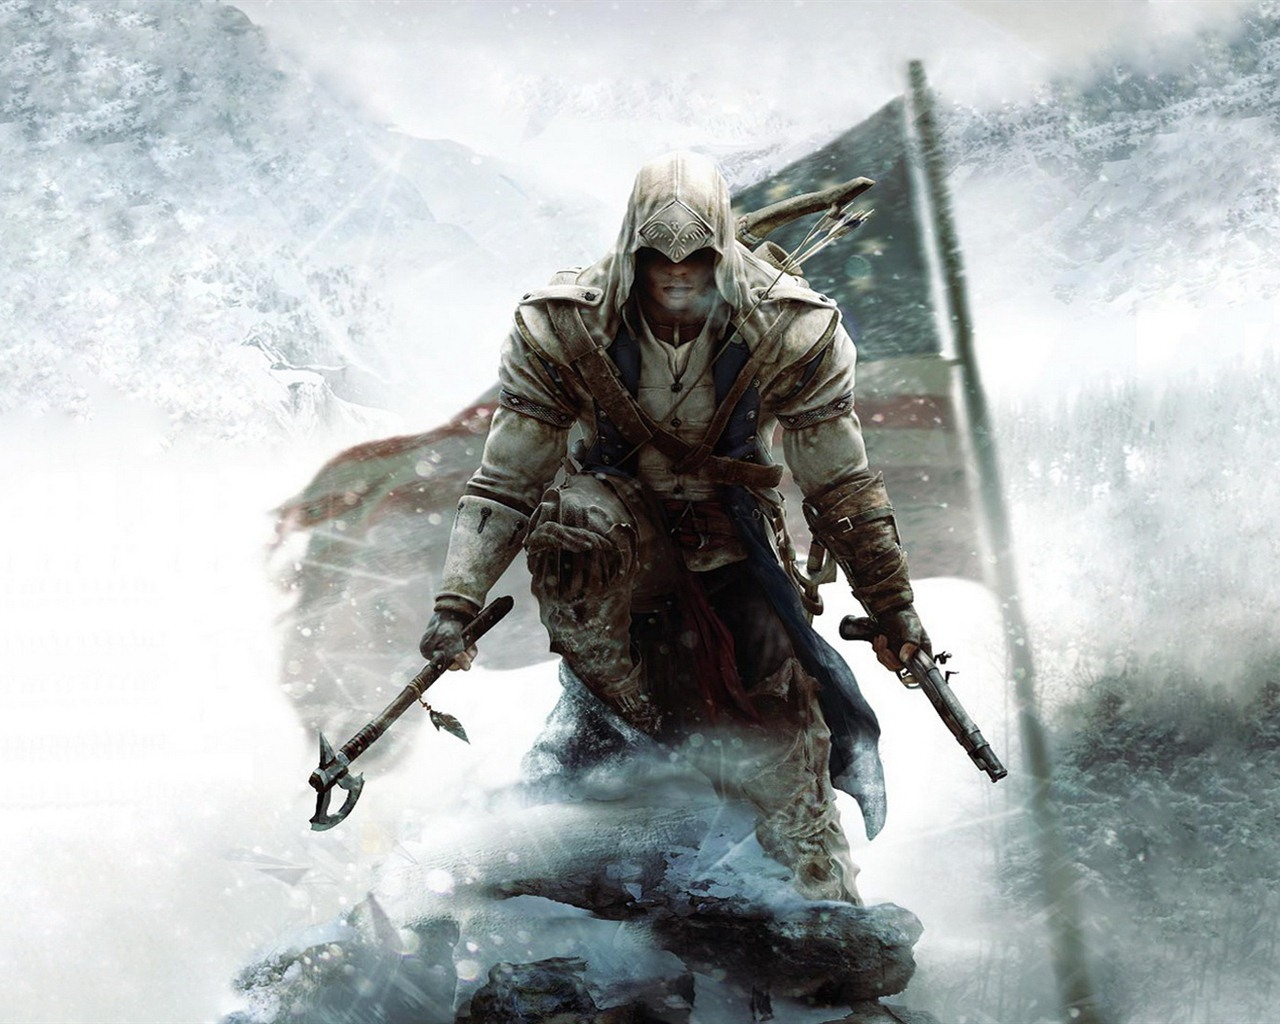 Assassins Creed 3 HD wallpapers 20   1280x1024 Wallpaper Download 1280x1024